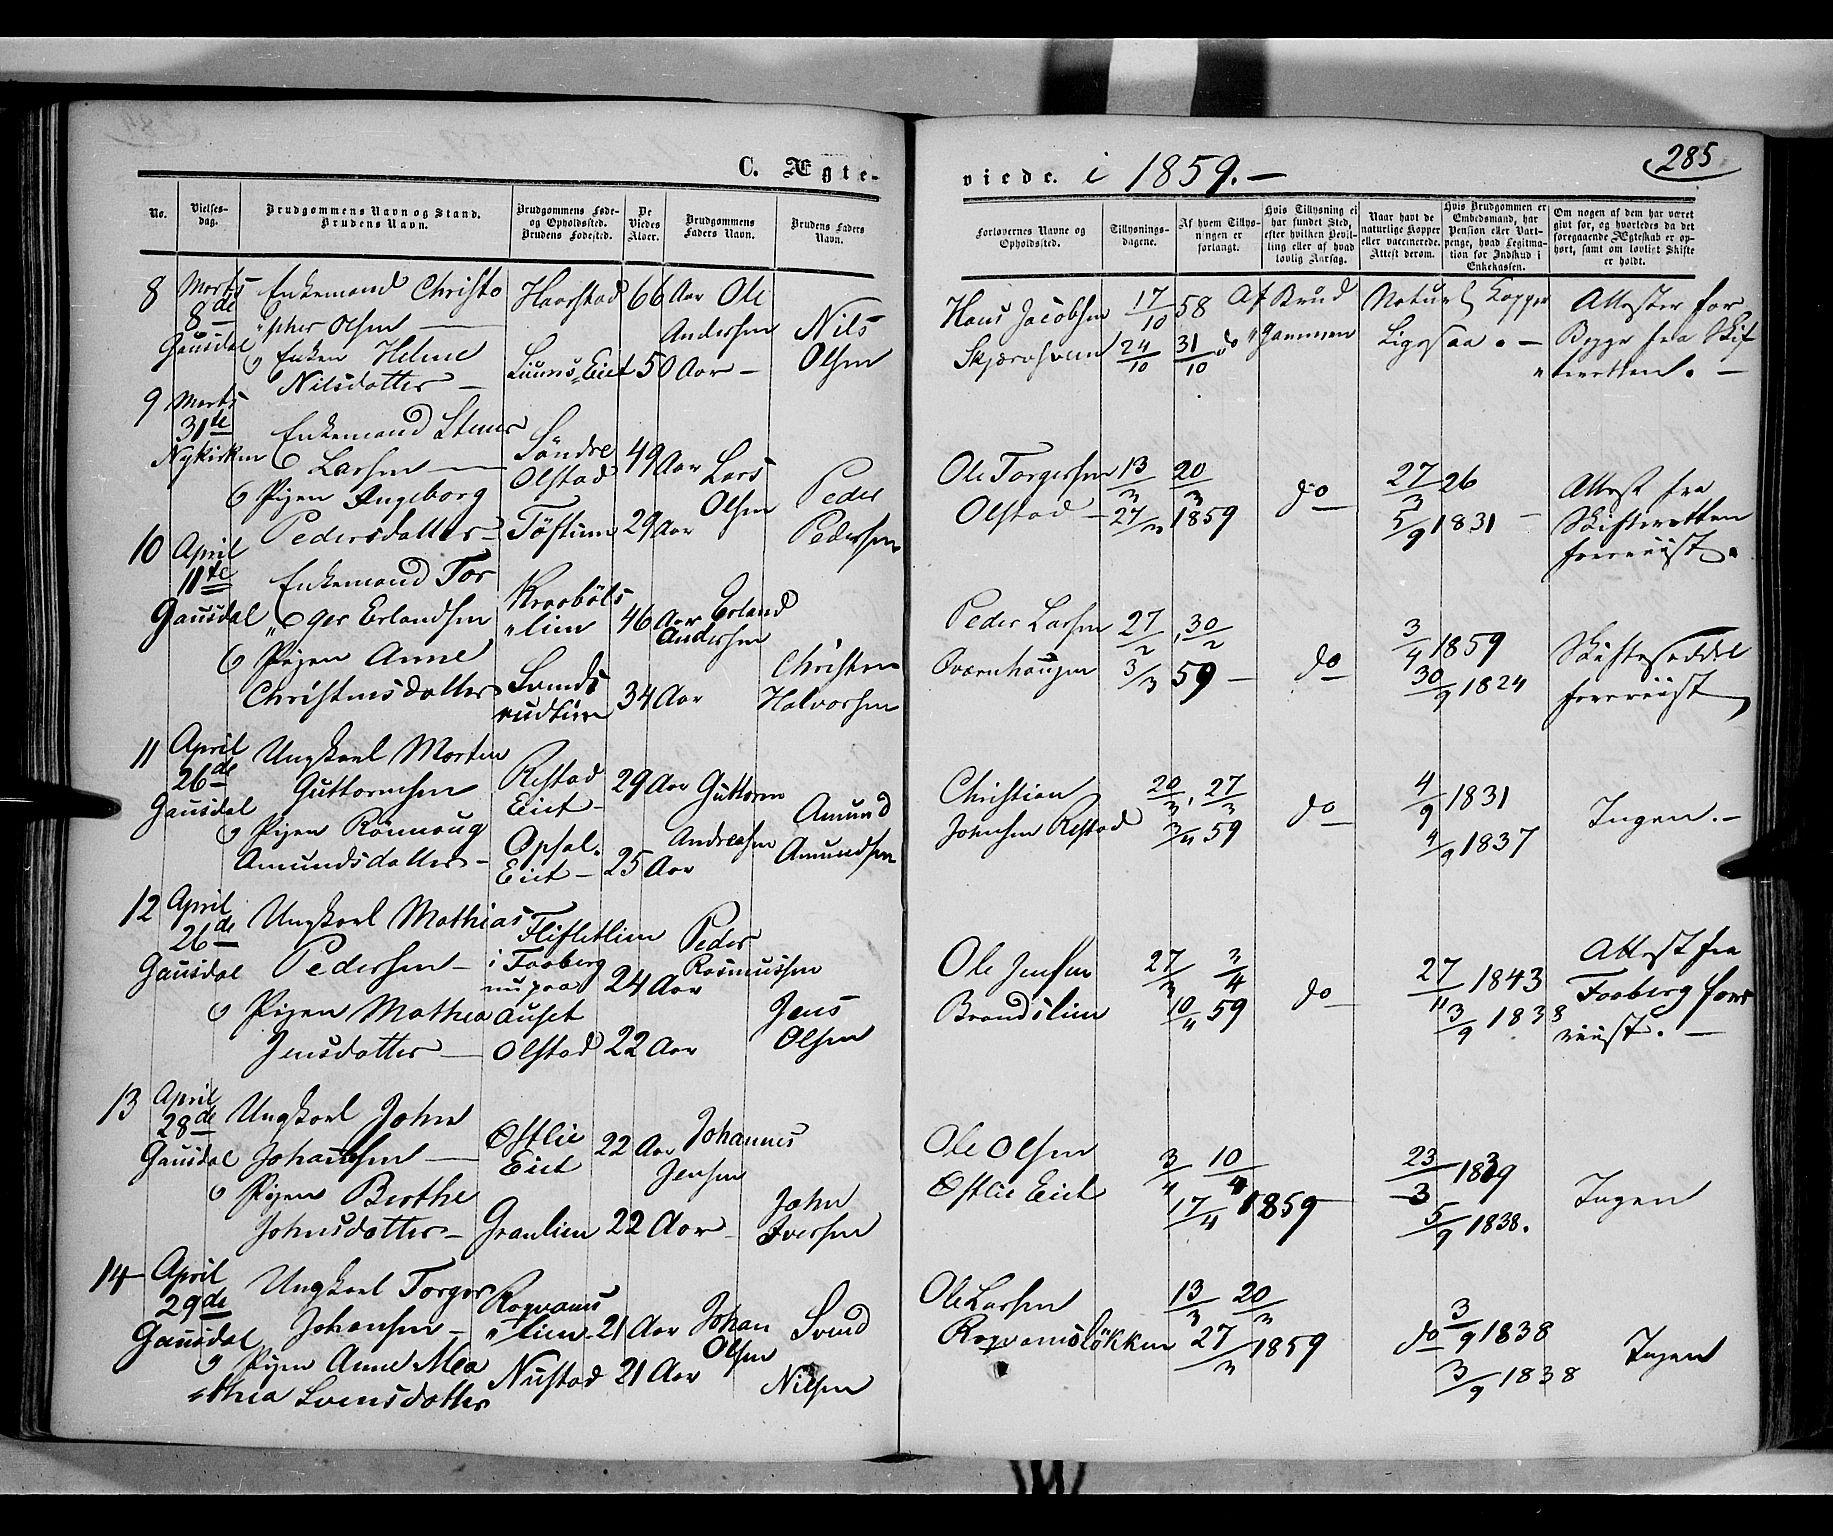 SAH, Gausdal prestekontor, Ministerialbok nr. 8, 1850-1861, s. 285